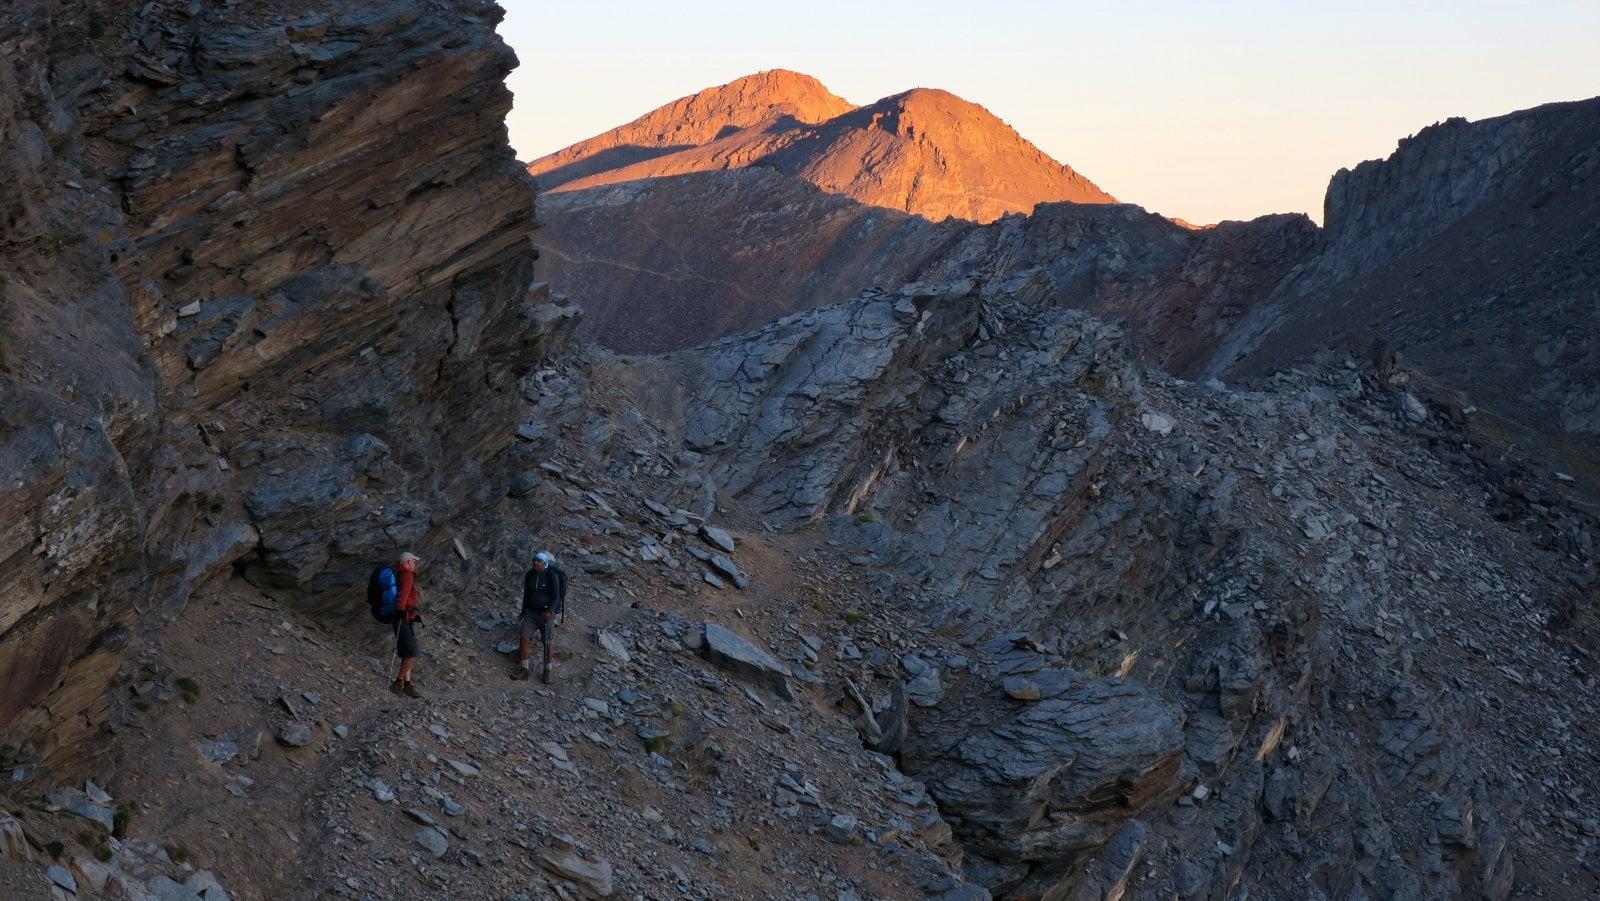 Morning light on Veleta and Cerro de los Machos